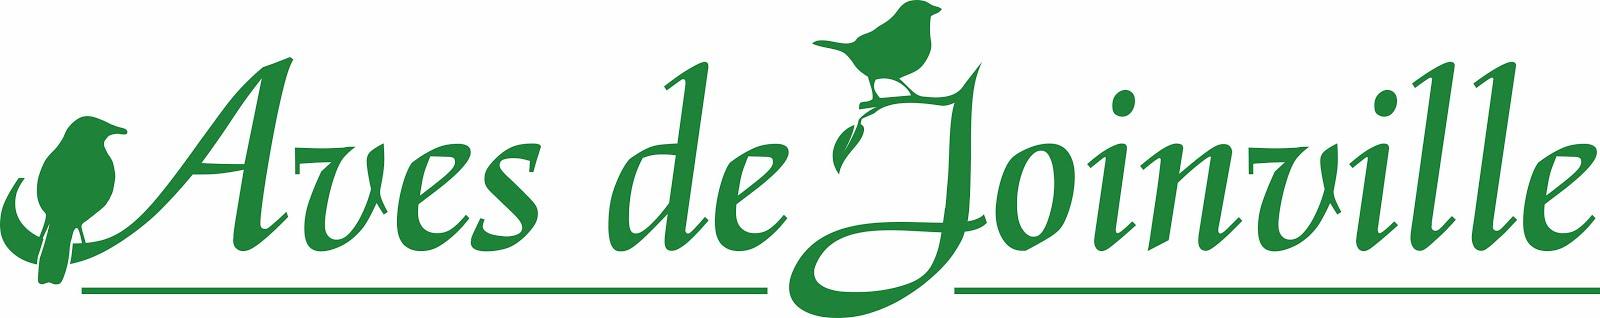 Almanaque Aves de Joinville